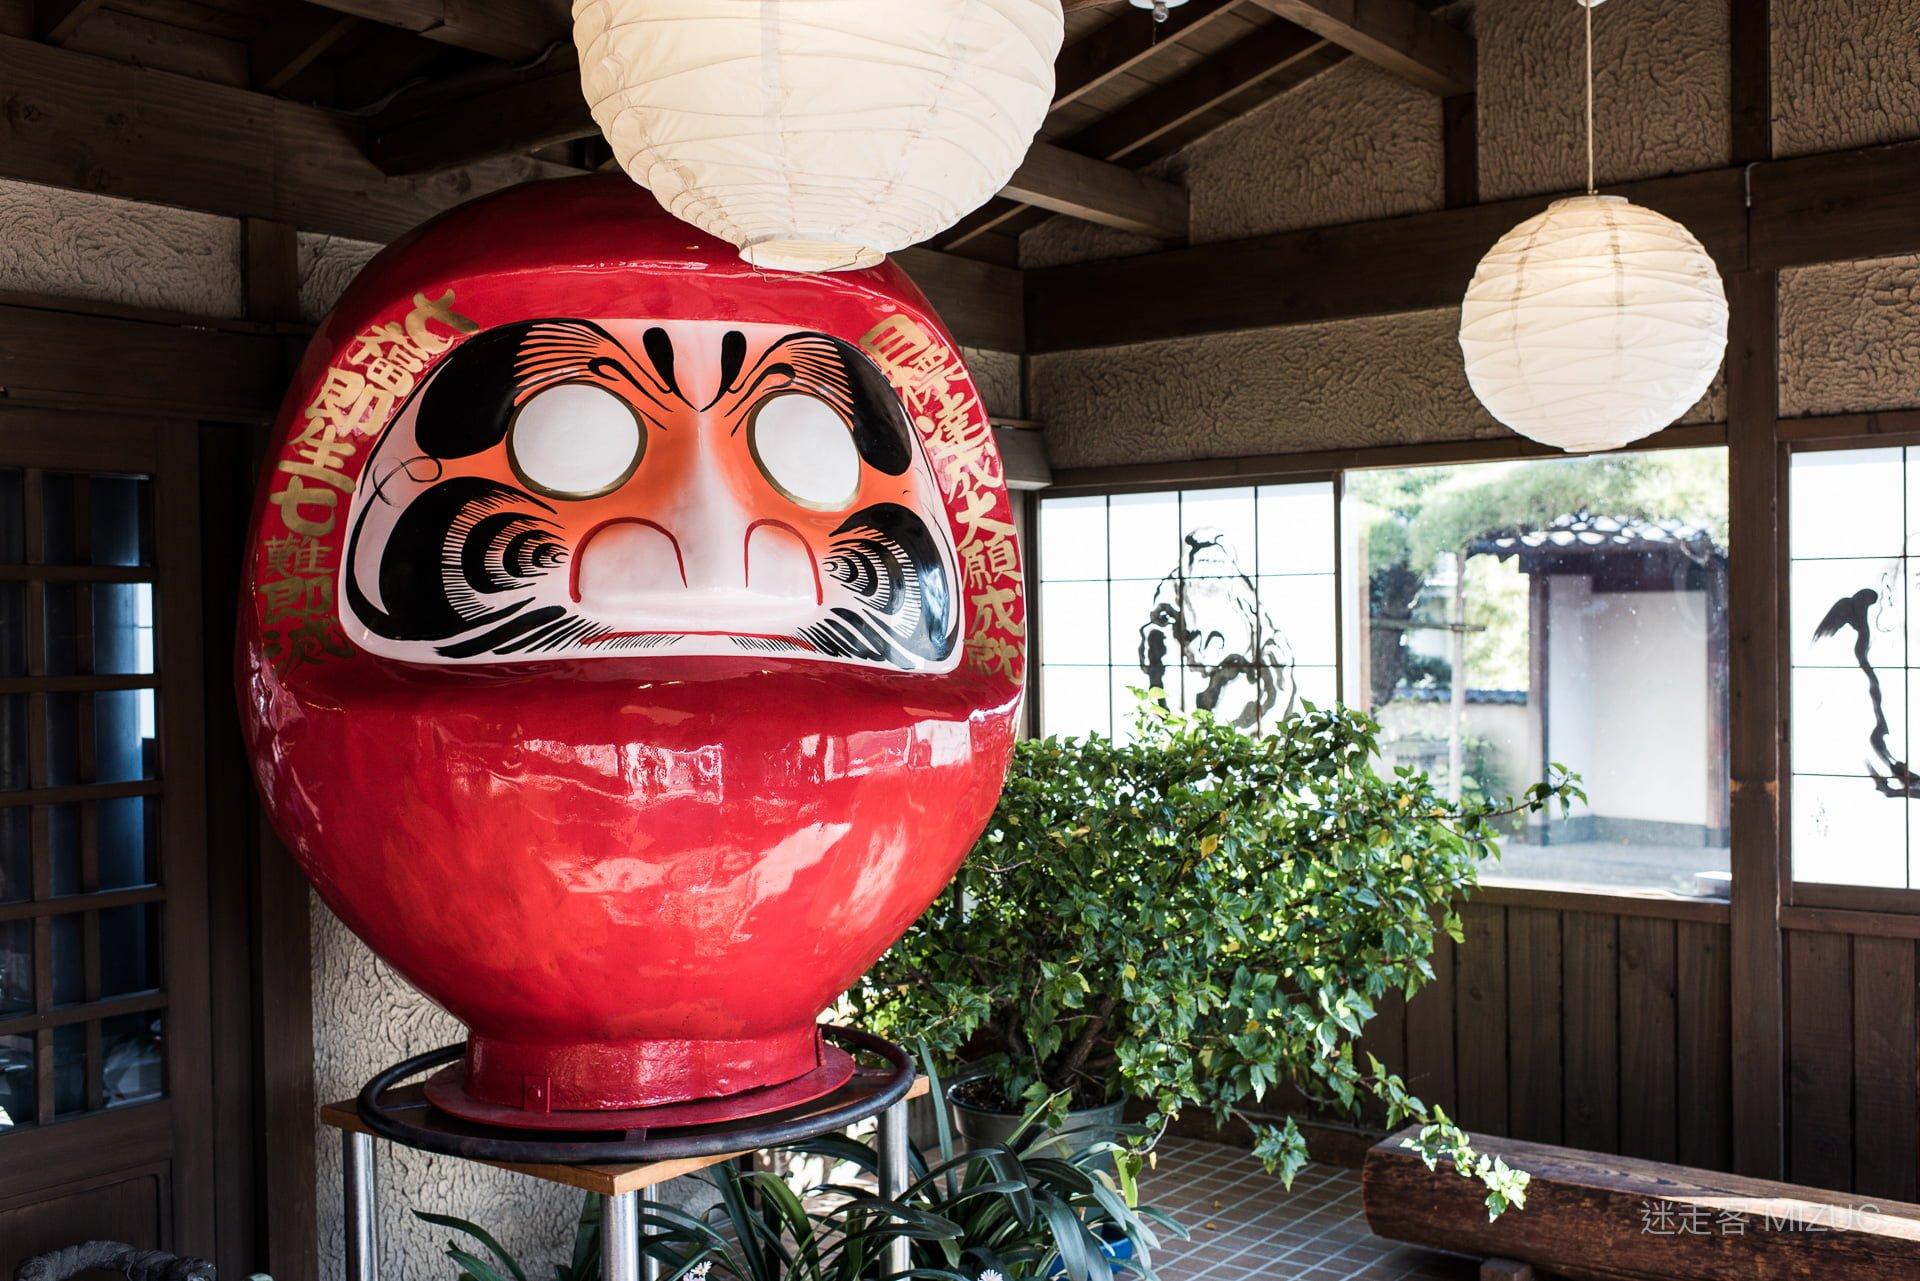 201711 Ibaraki Tochigi Gunma Japan Travel By RentalCar 77 日本自駕旅遊/北關東三縣「茨城、櫪木、群馬」秋天美食、溫泉與瀑布秘境百景(精選照片分享)